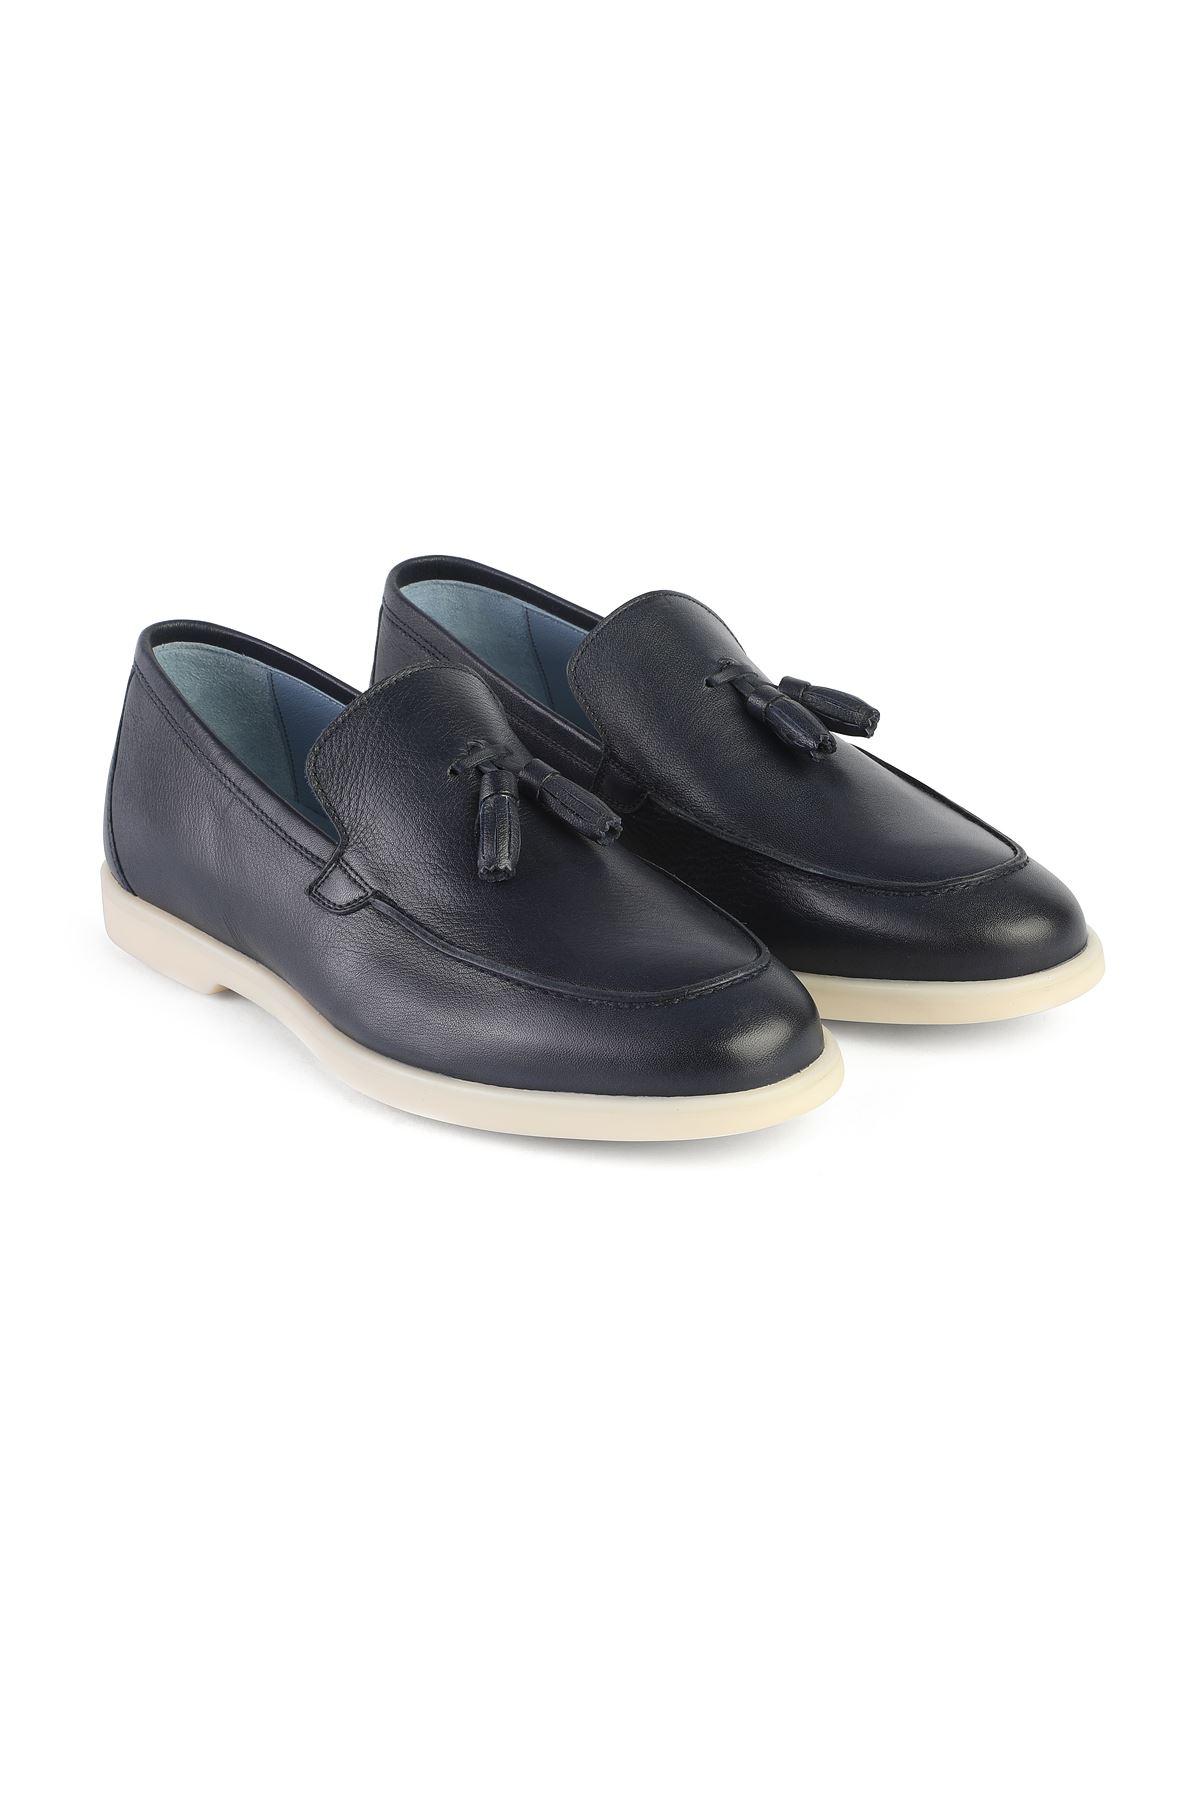 Libero 3219 Black Loafer Shoes